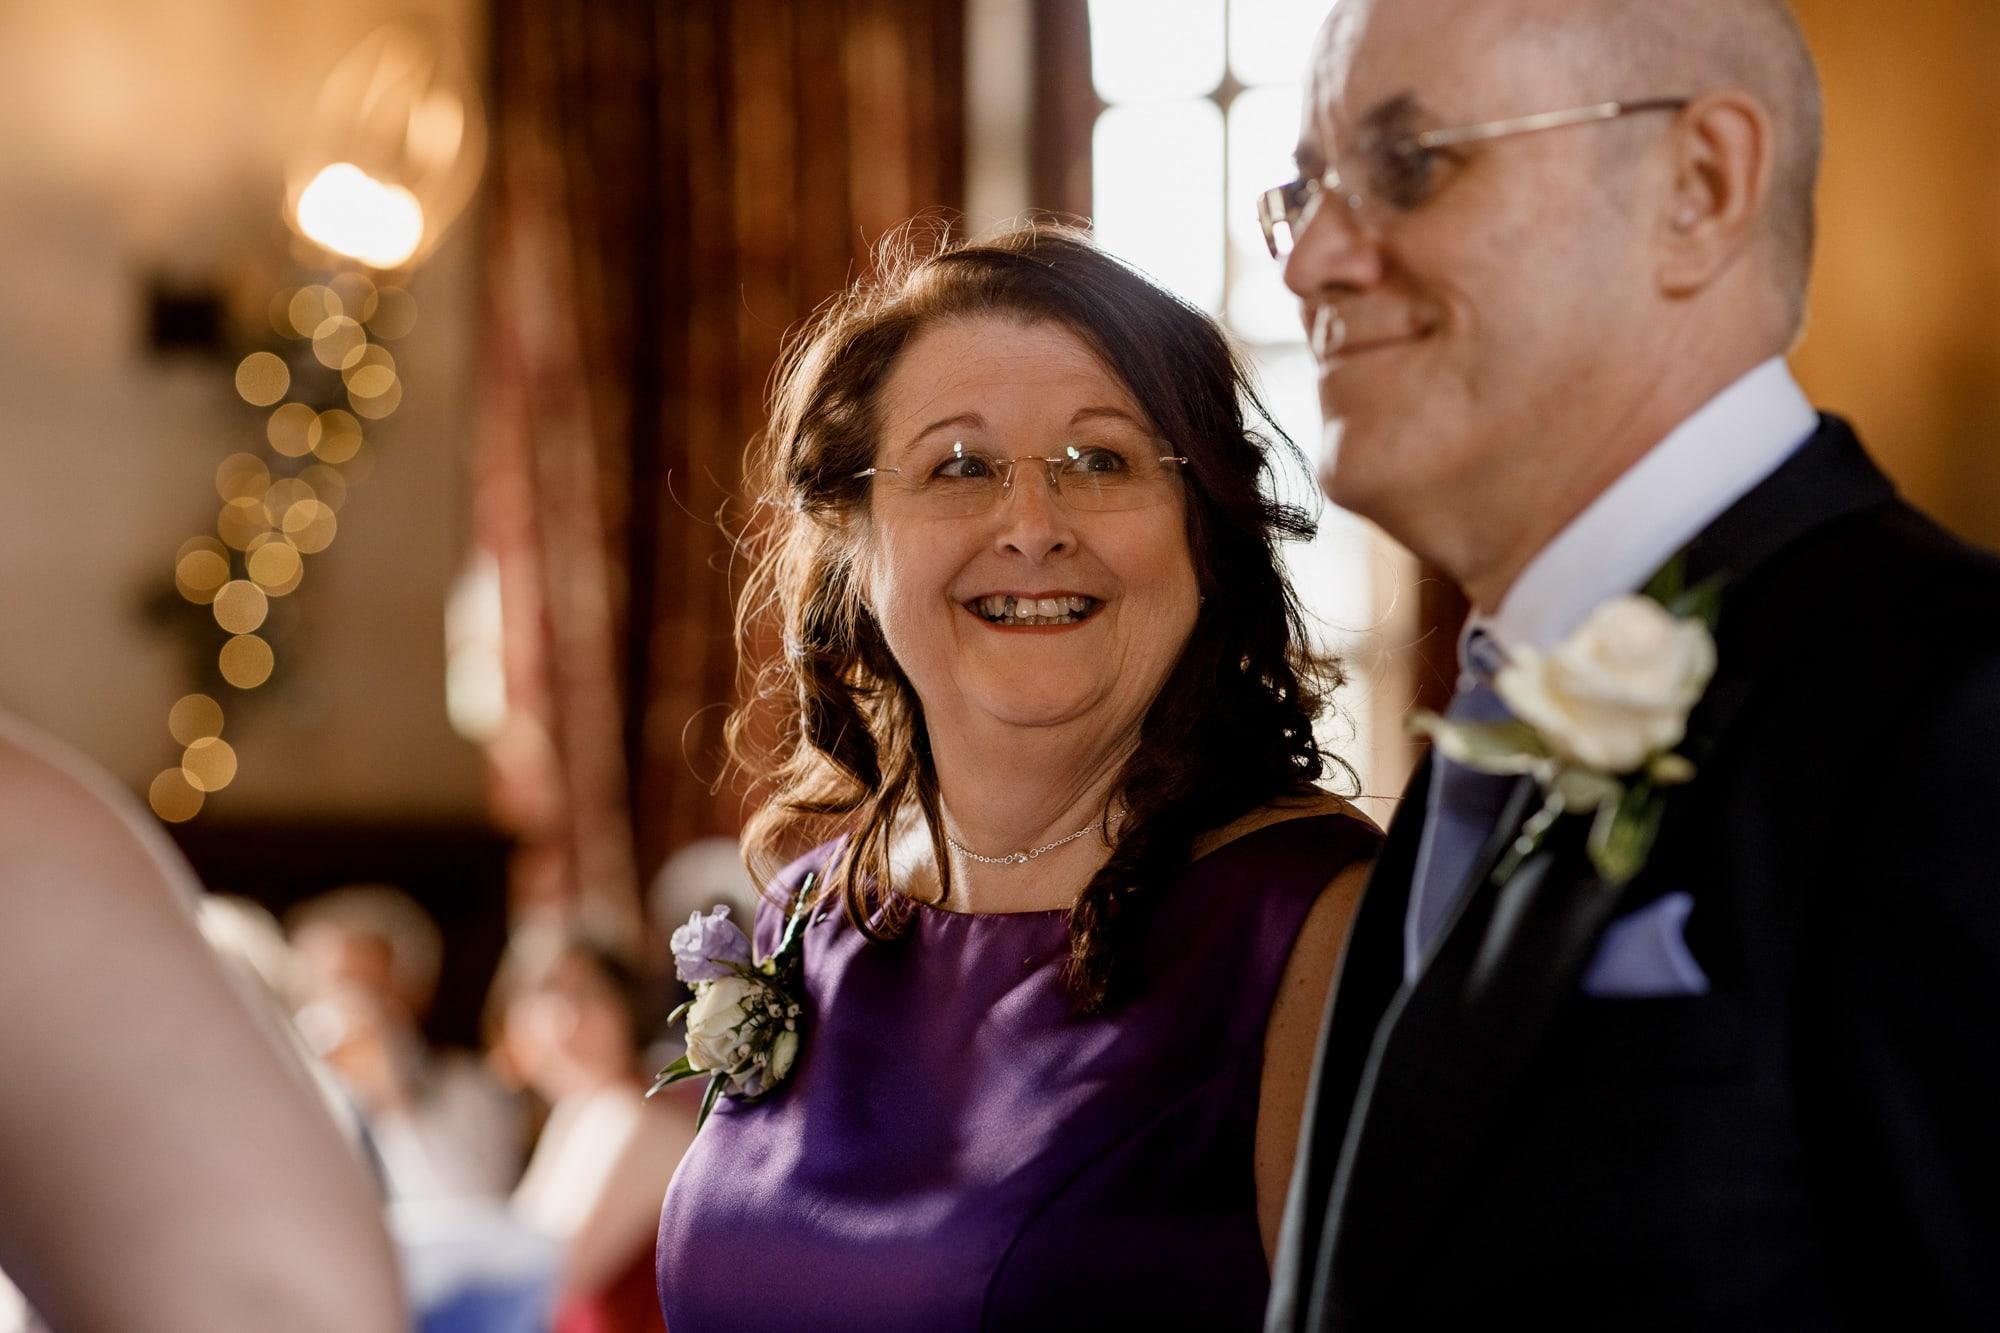 parents smiling at wedding